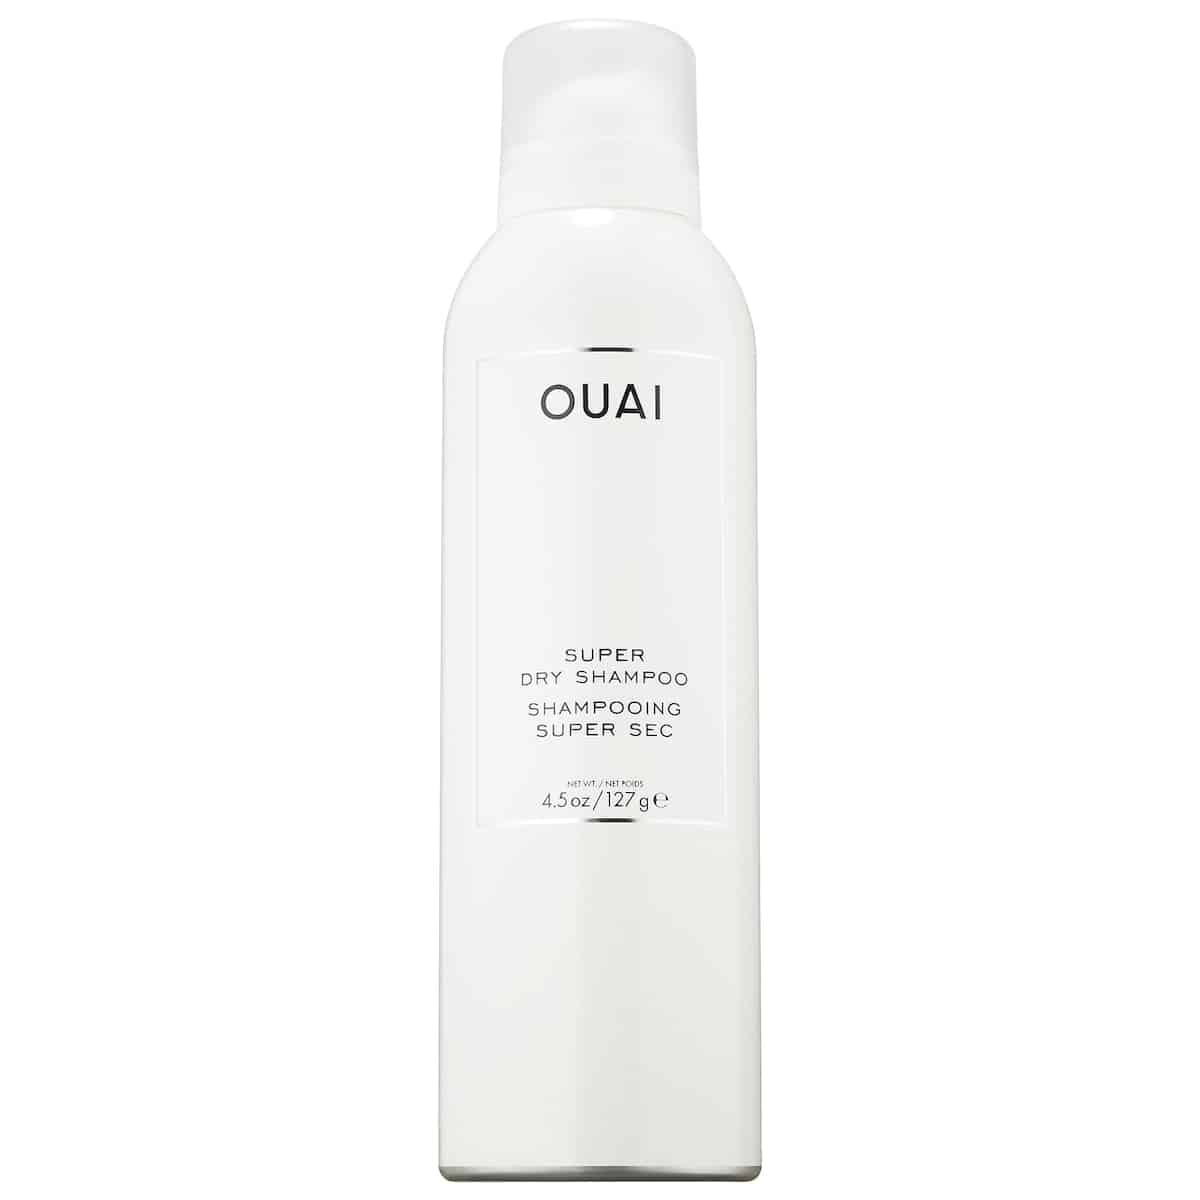 Super Dry Shampoo, Ouai